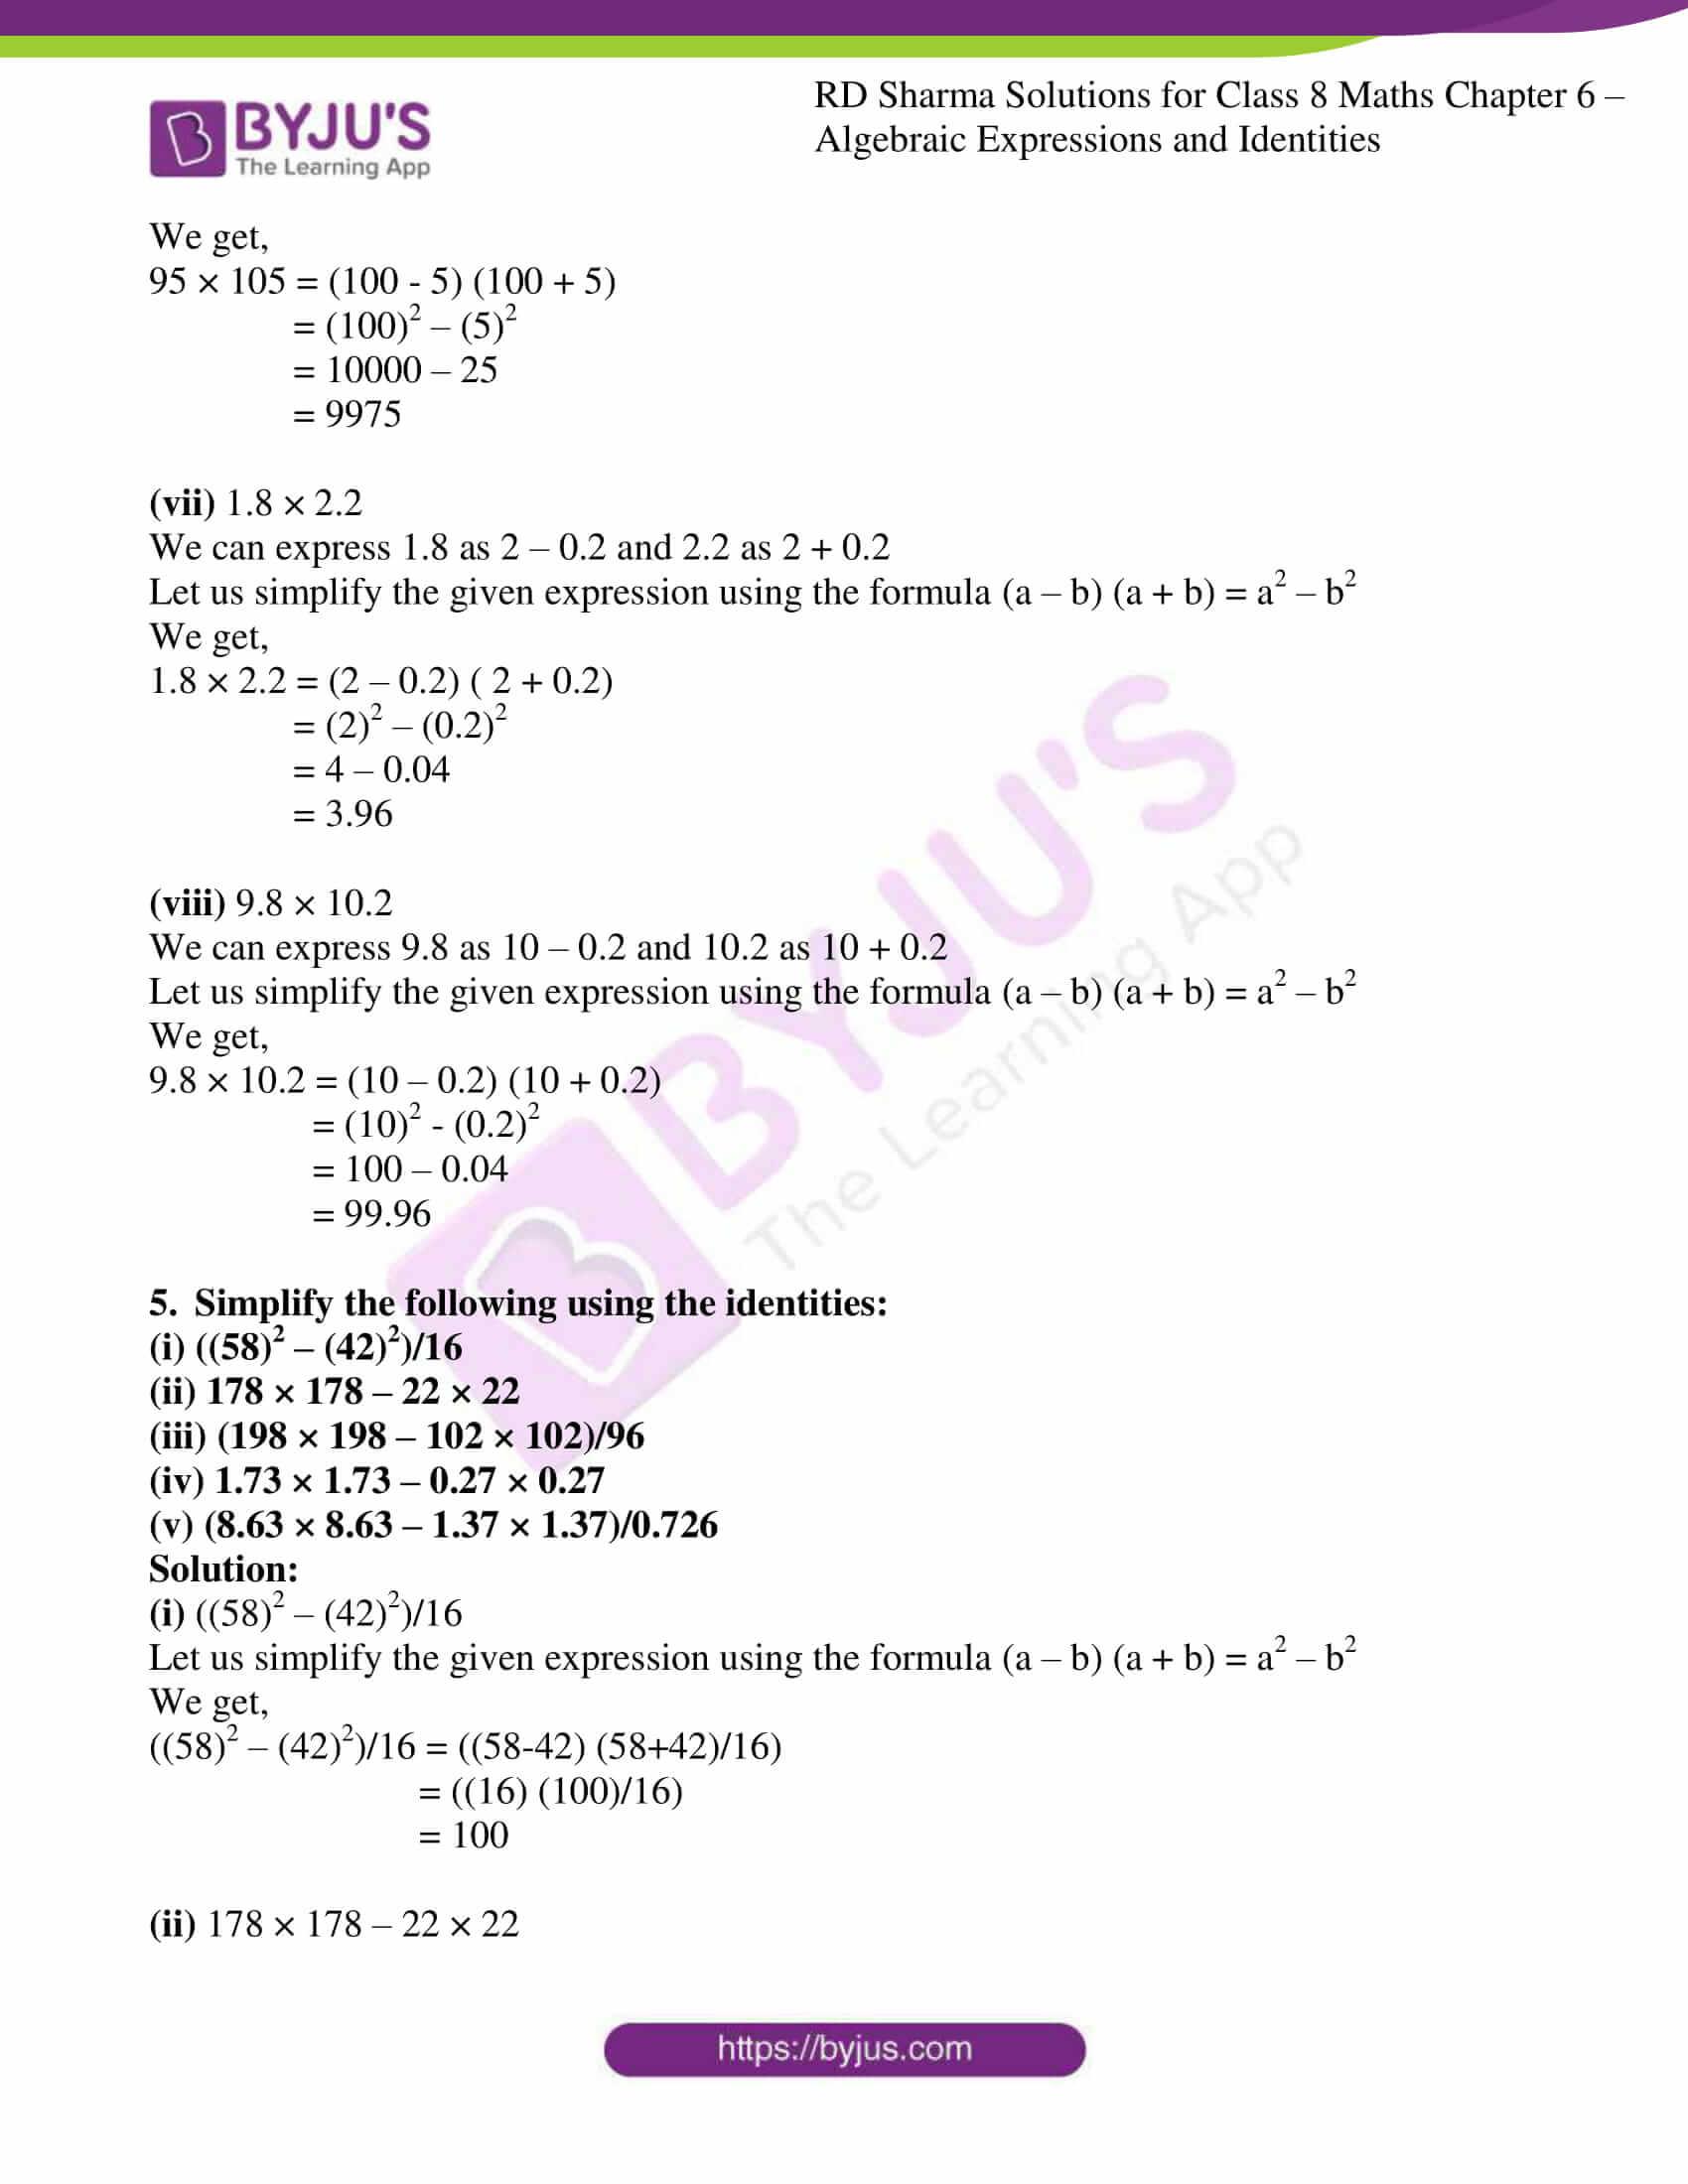 rd sharma class 8 maths chapter 6 exercise 6 07